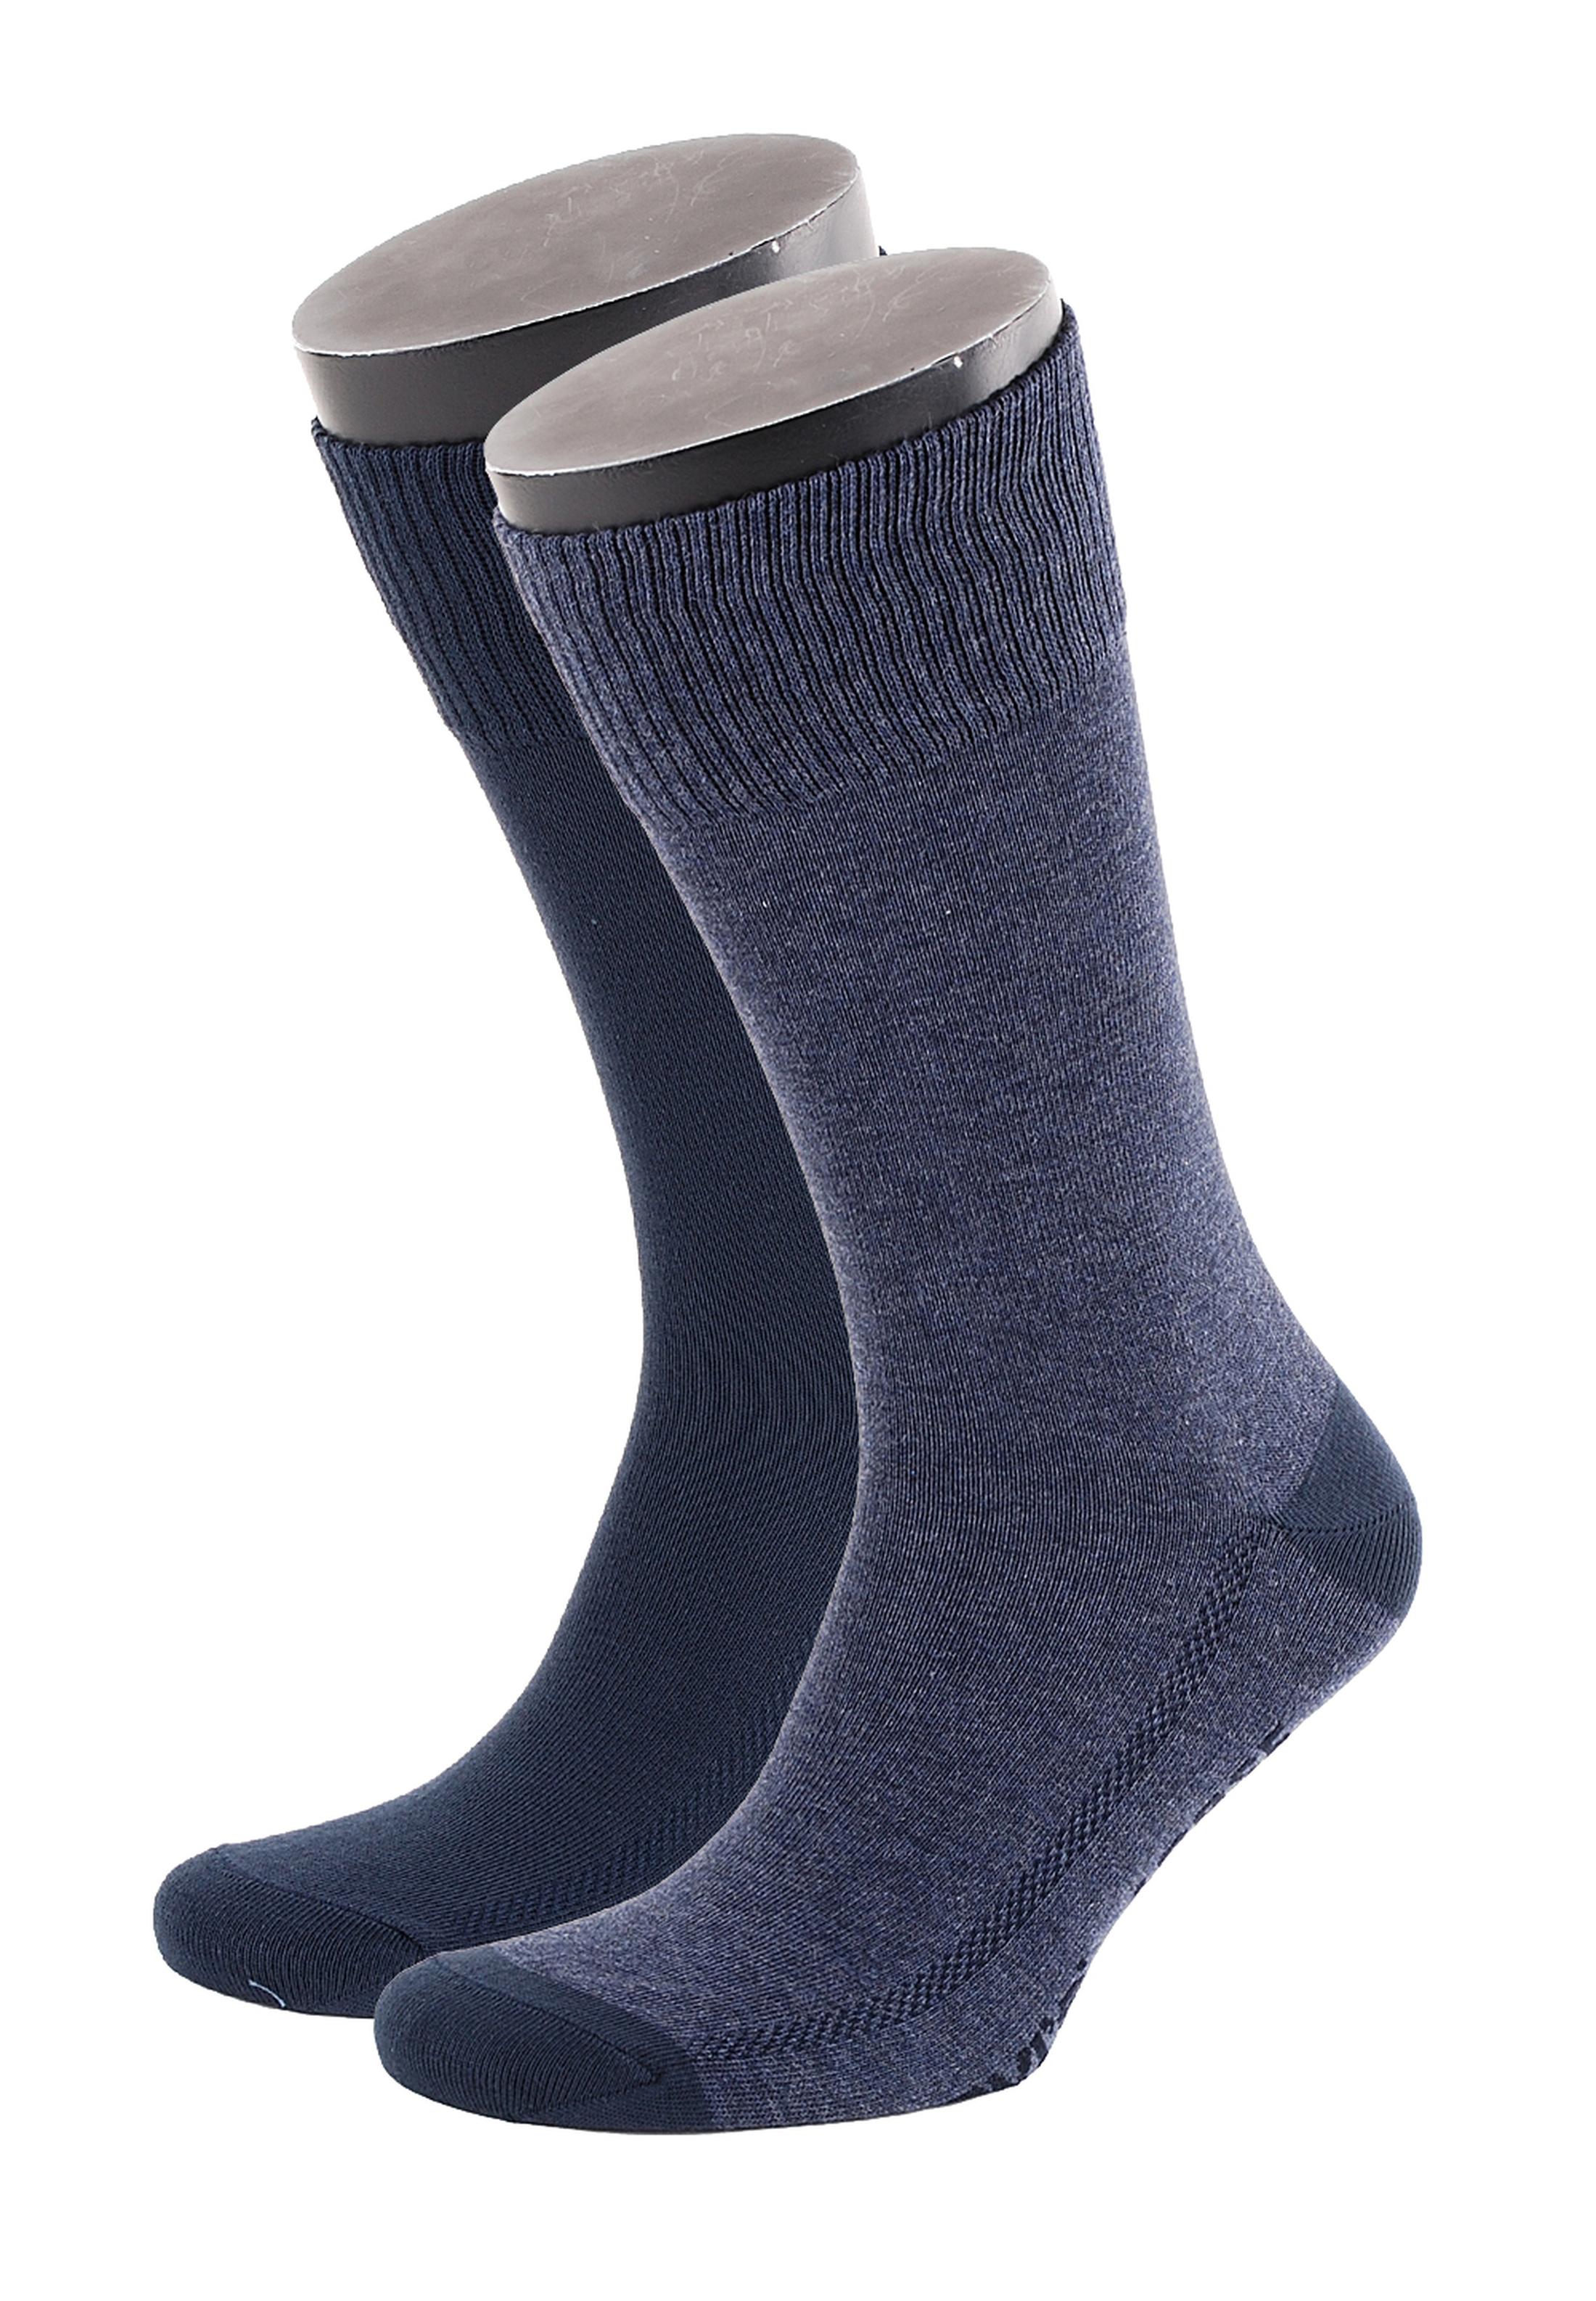 Levi's Socks Cotton 2-Pack Indigo 825 foto 0